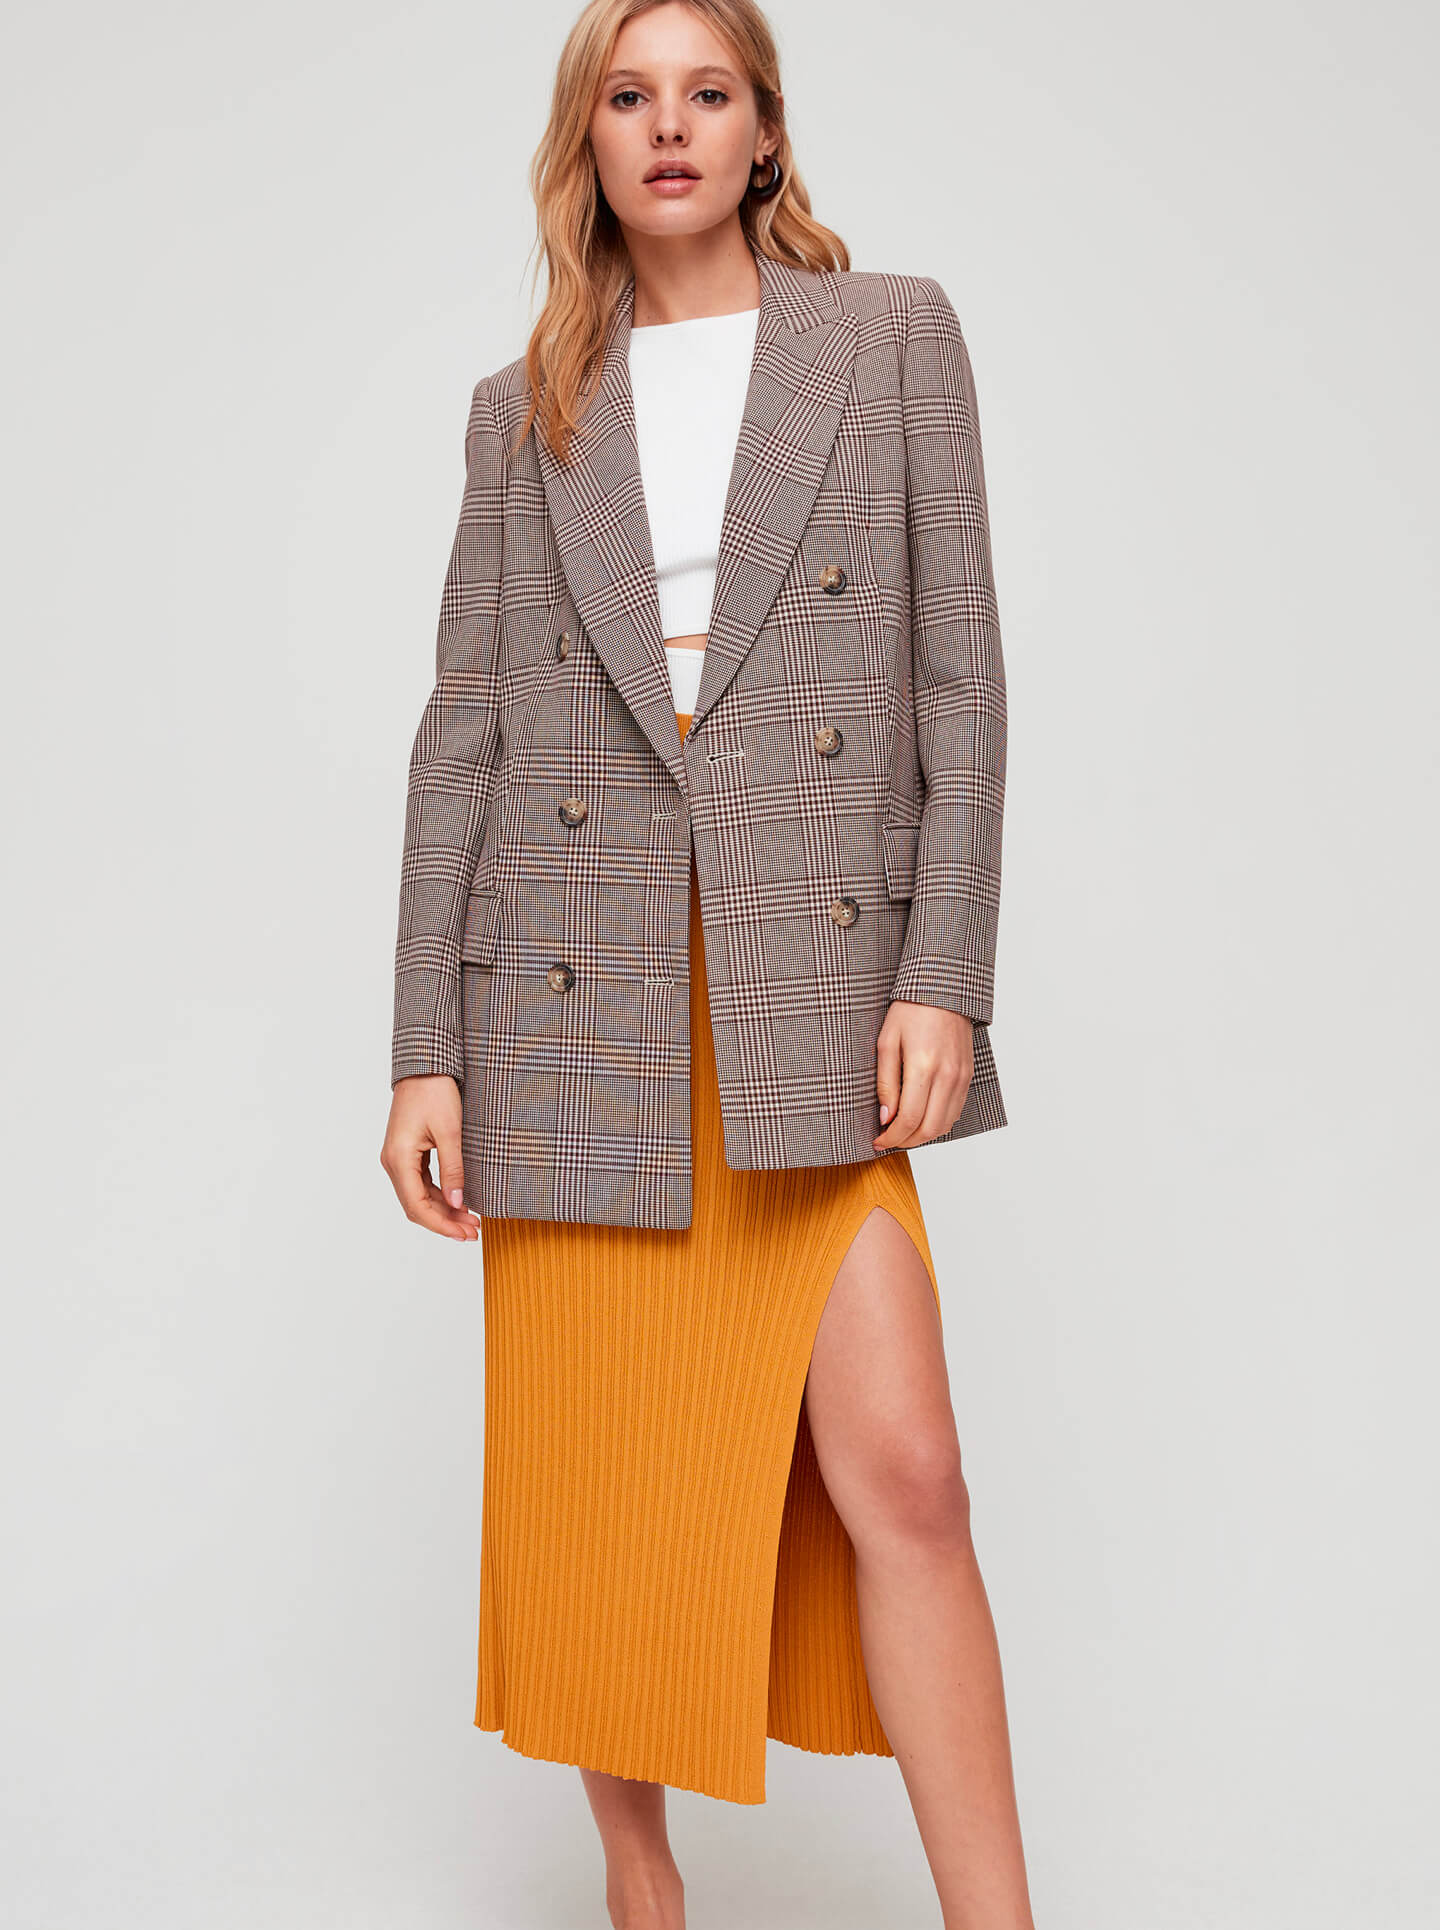 Women S Fashion Boutique Aritzia Ca